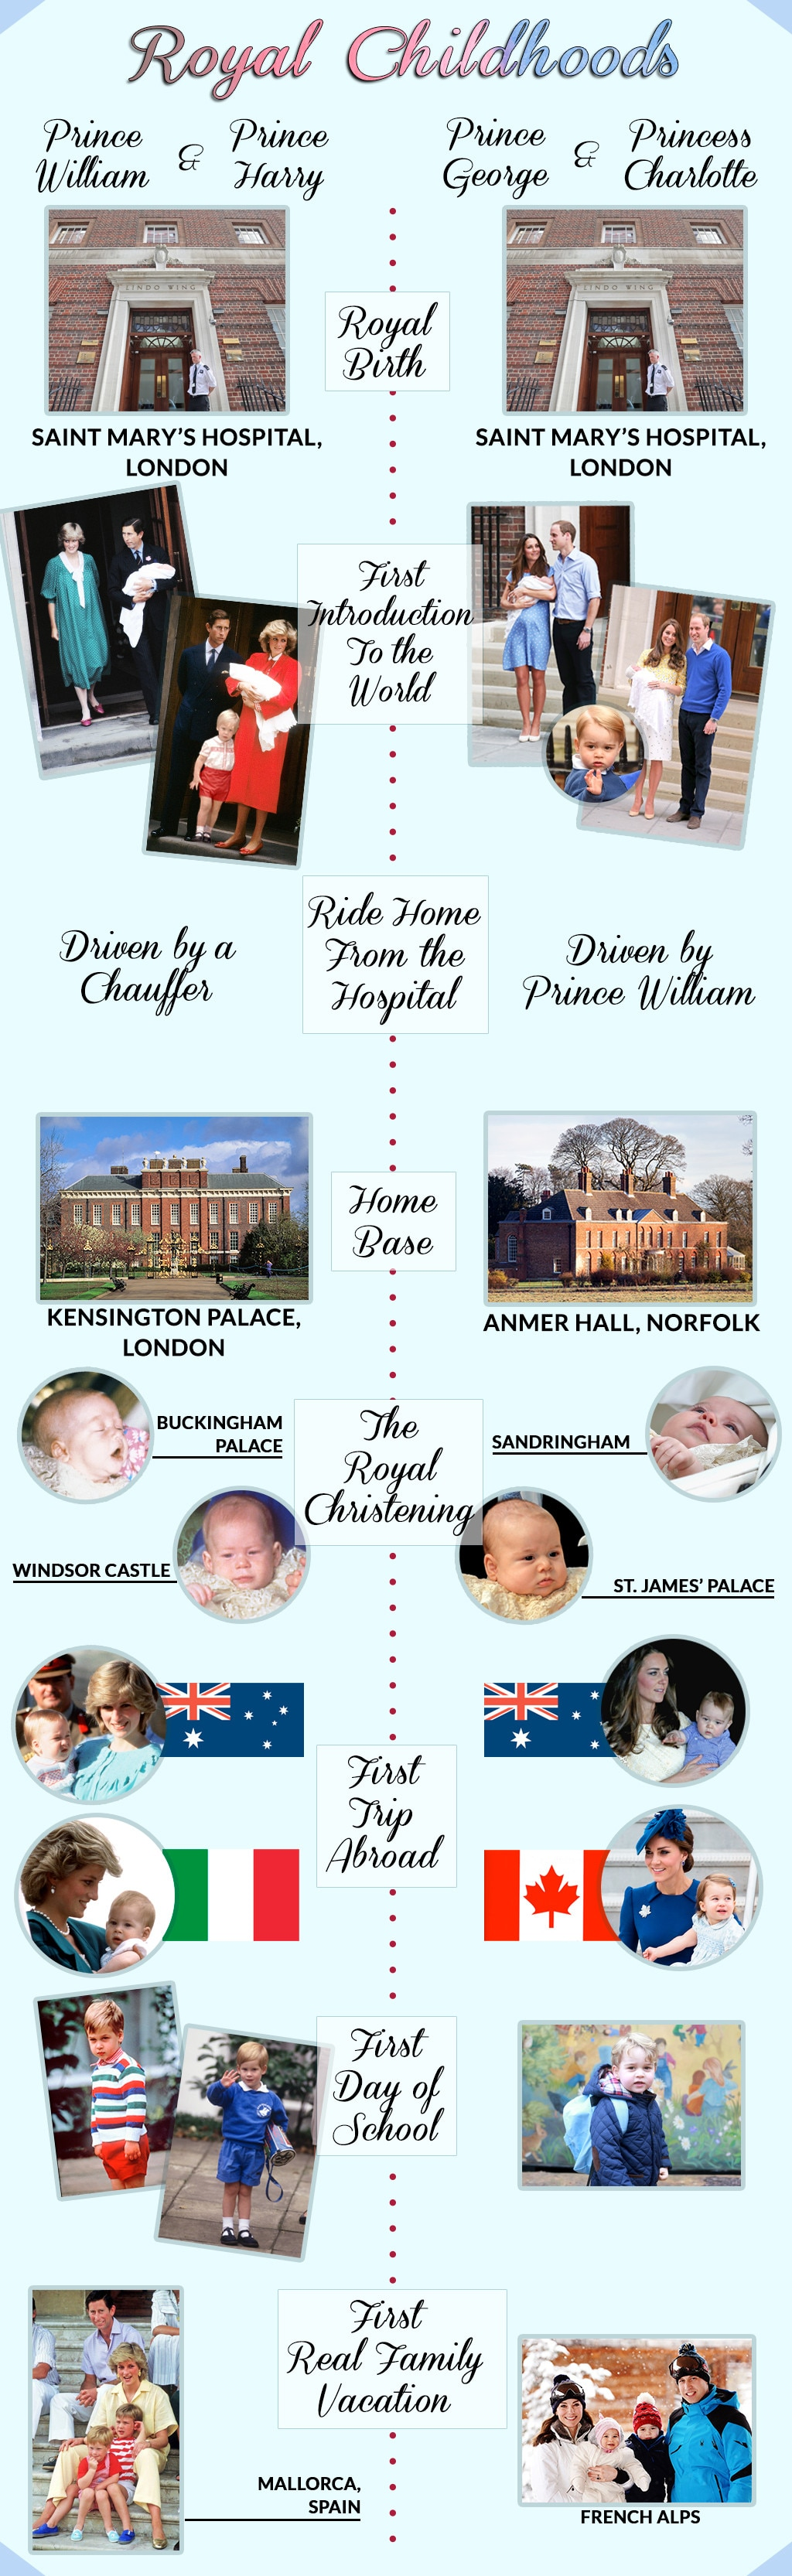 Timeline of the Royal Childhoods